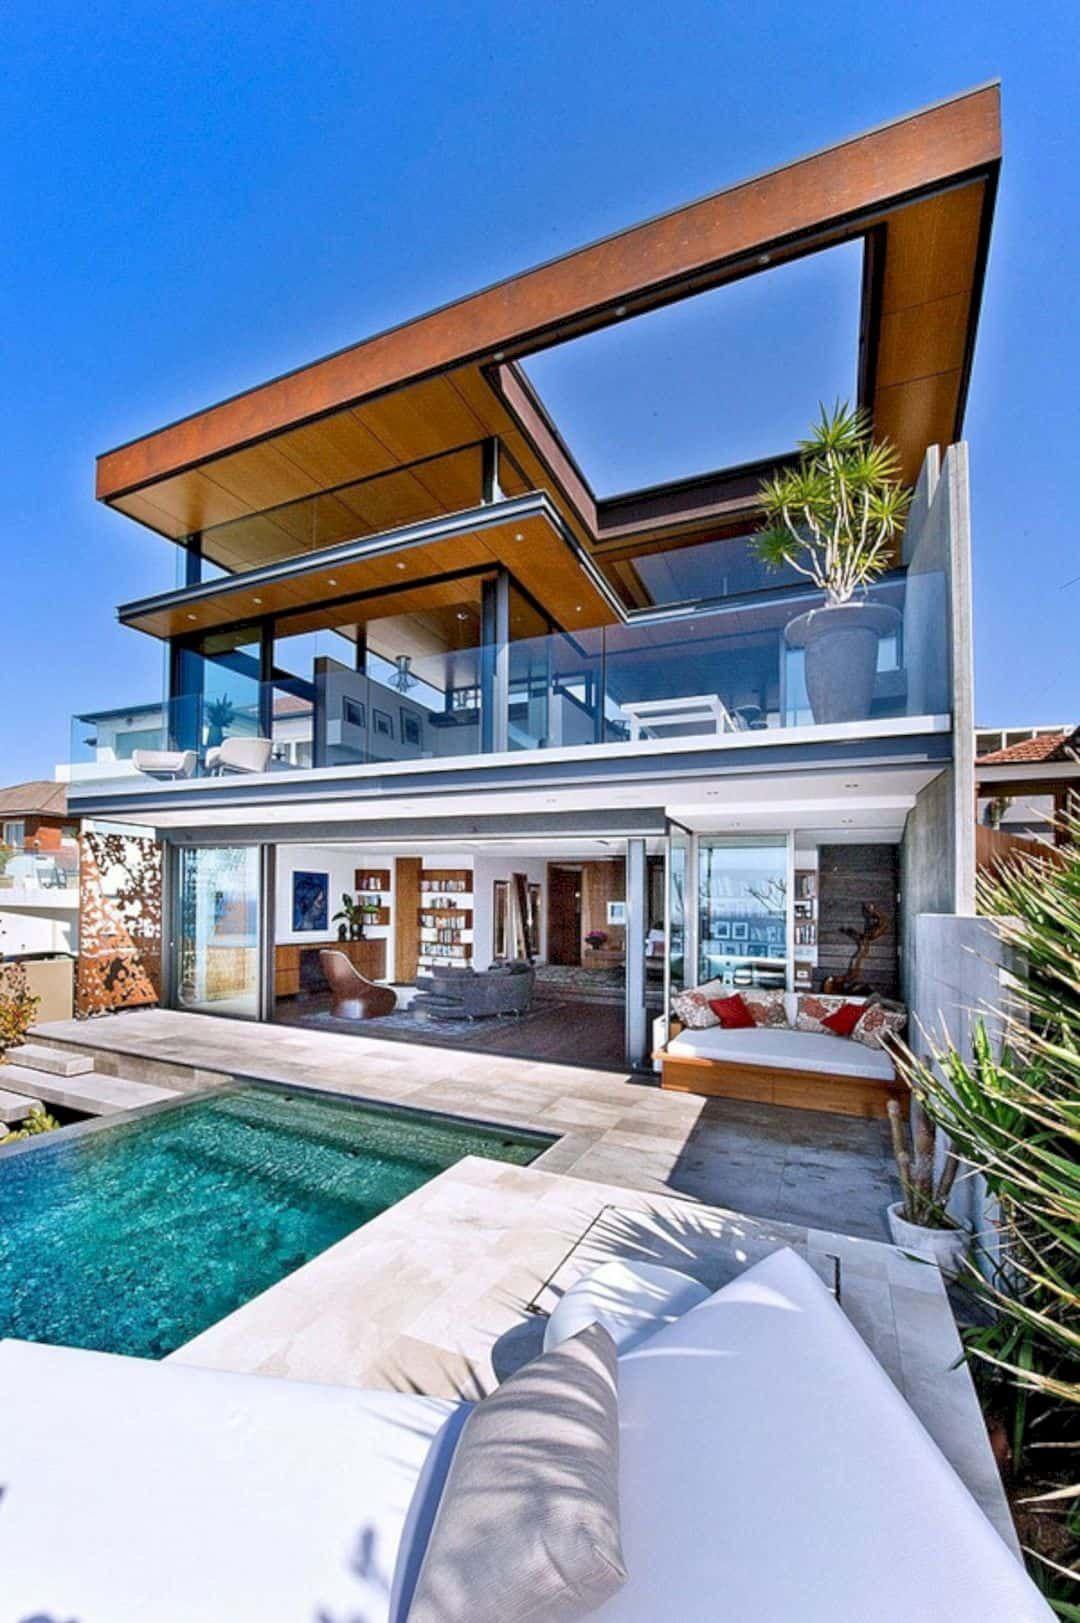 45+ Beach house design ideas information